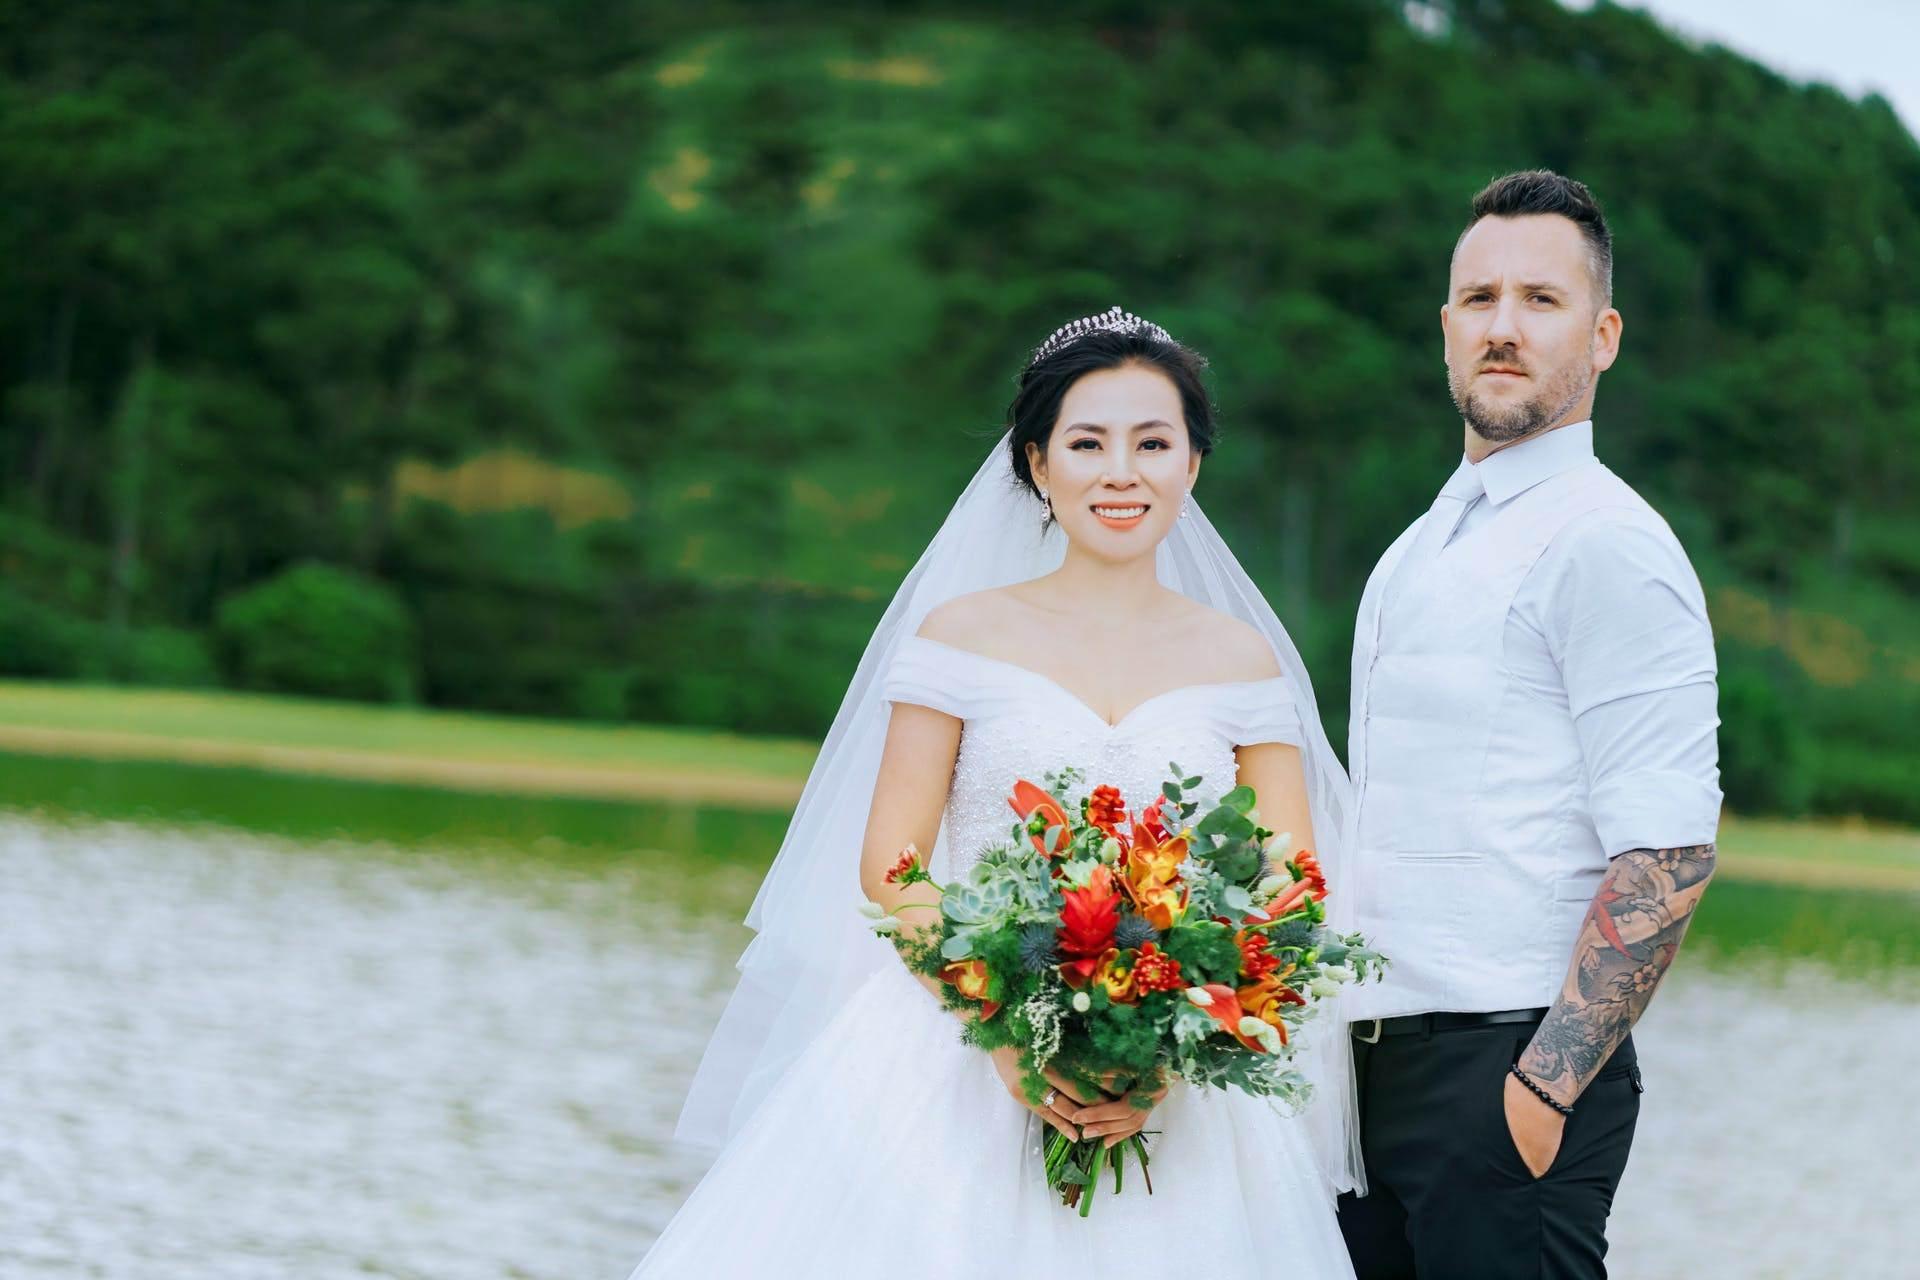 Wedding-Dresses-2461